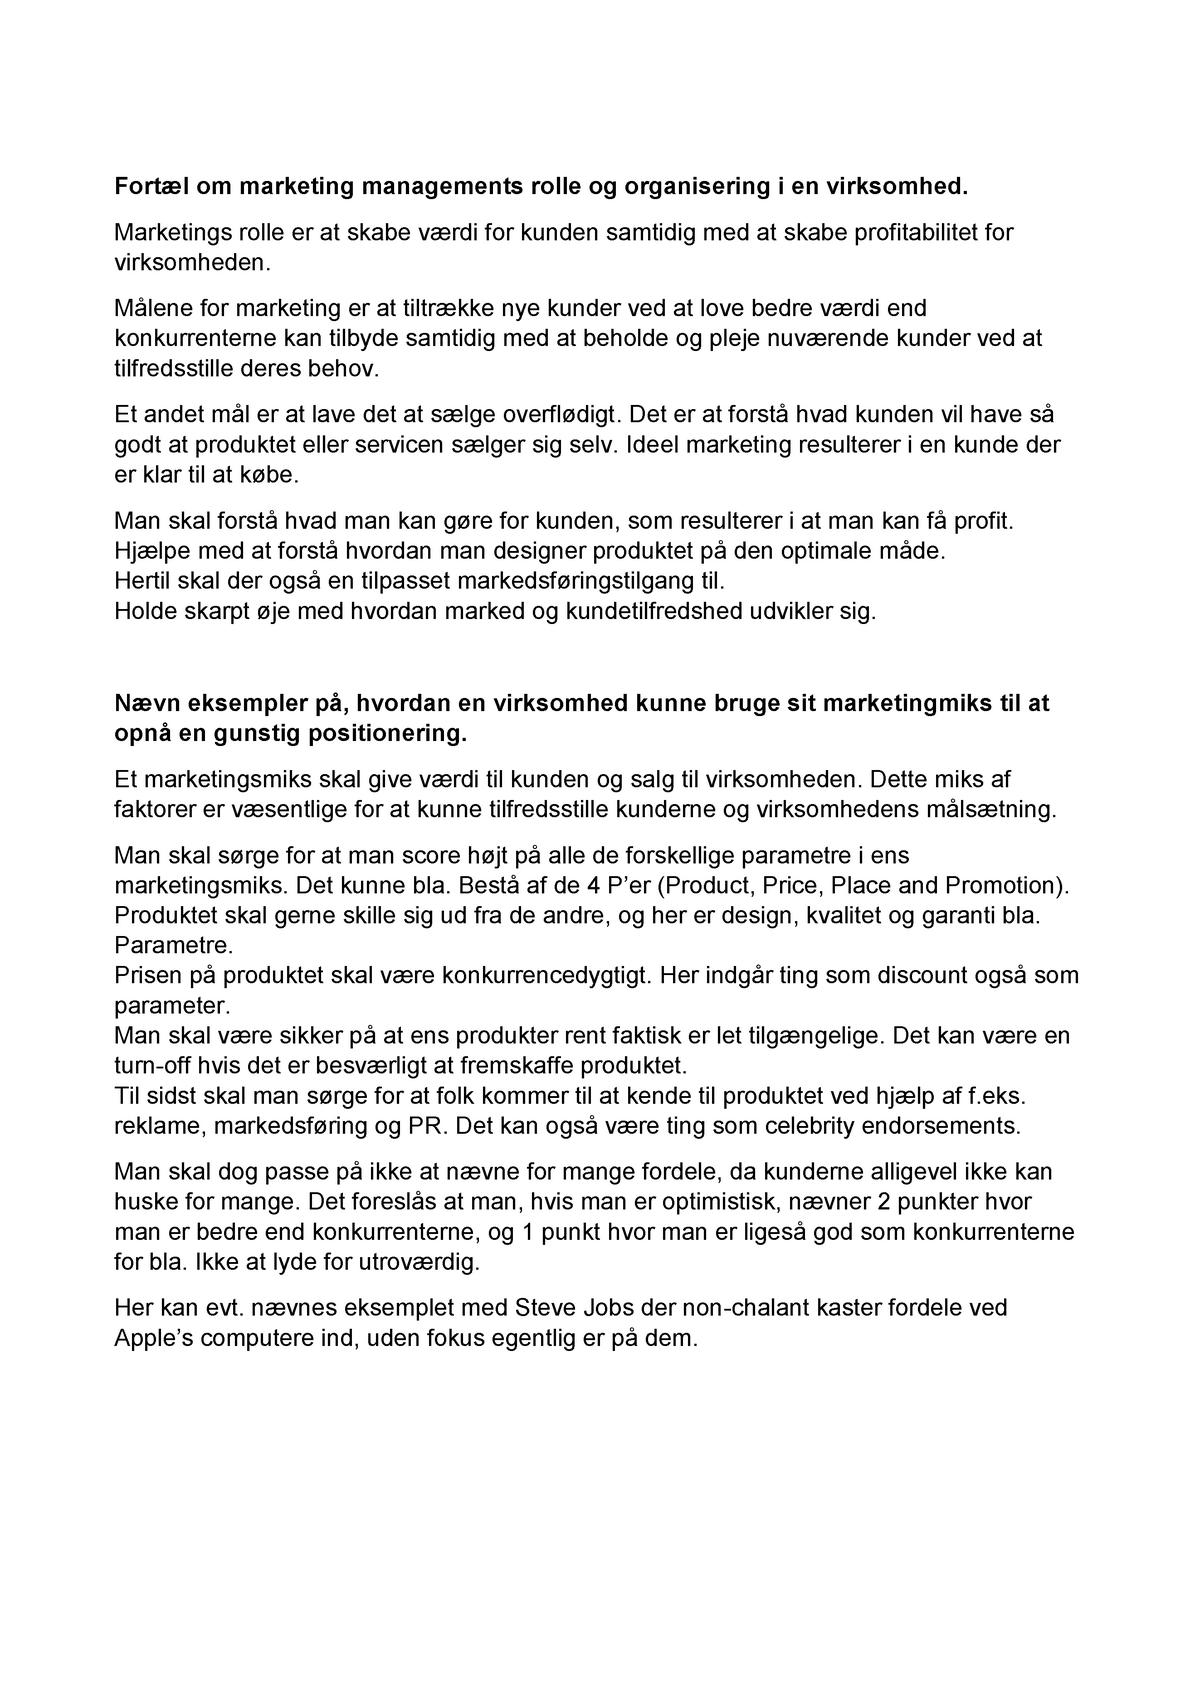 45394dffae2 Eksamen 2018 - :Marketing, økonomistyring og rapportering - StuDocu